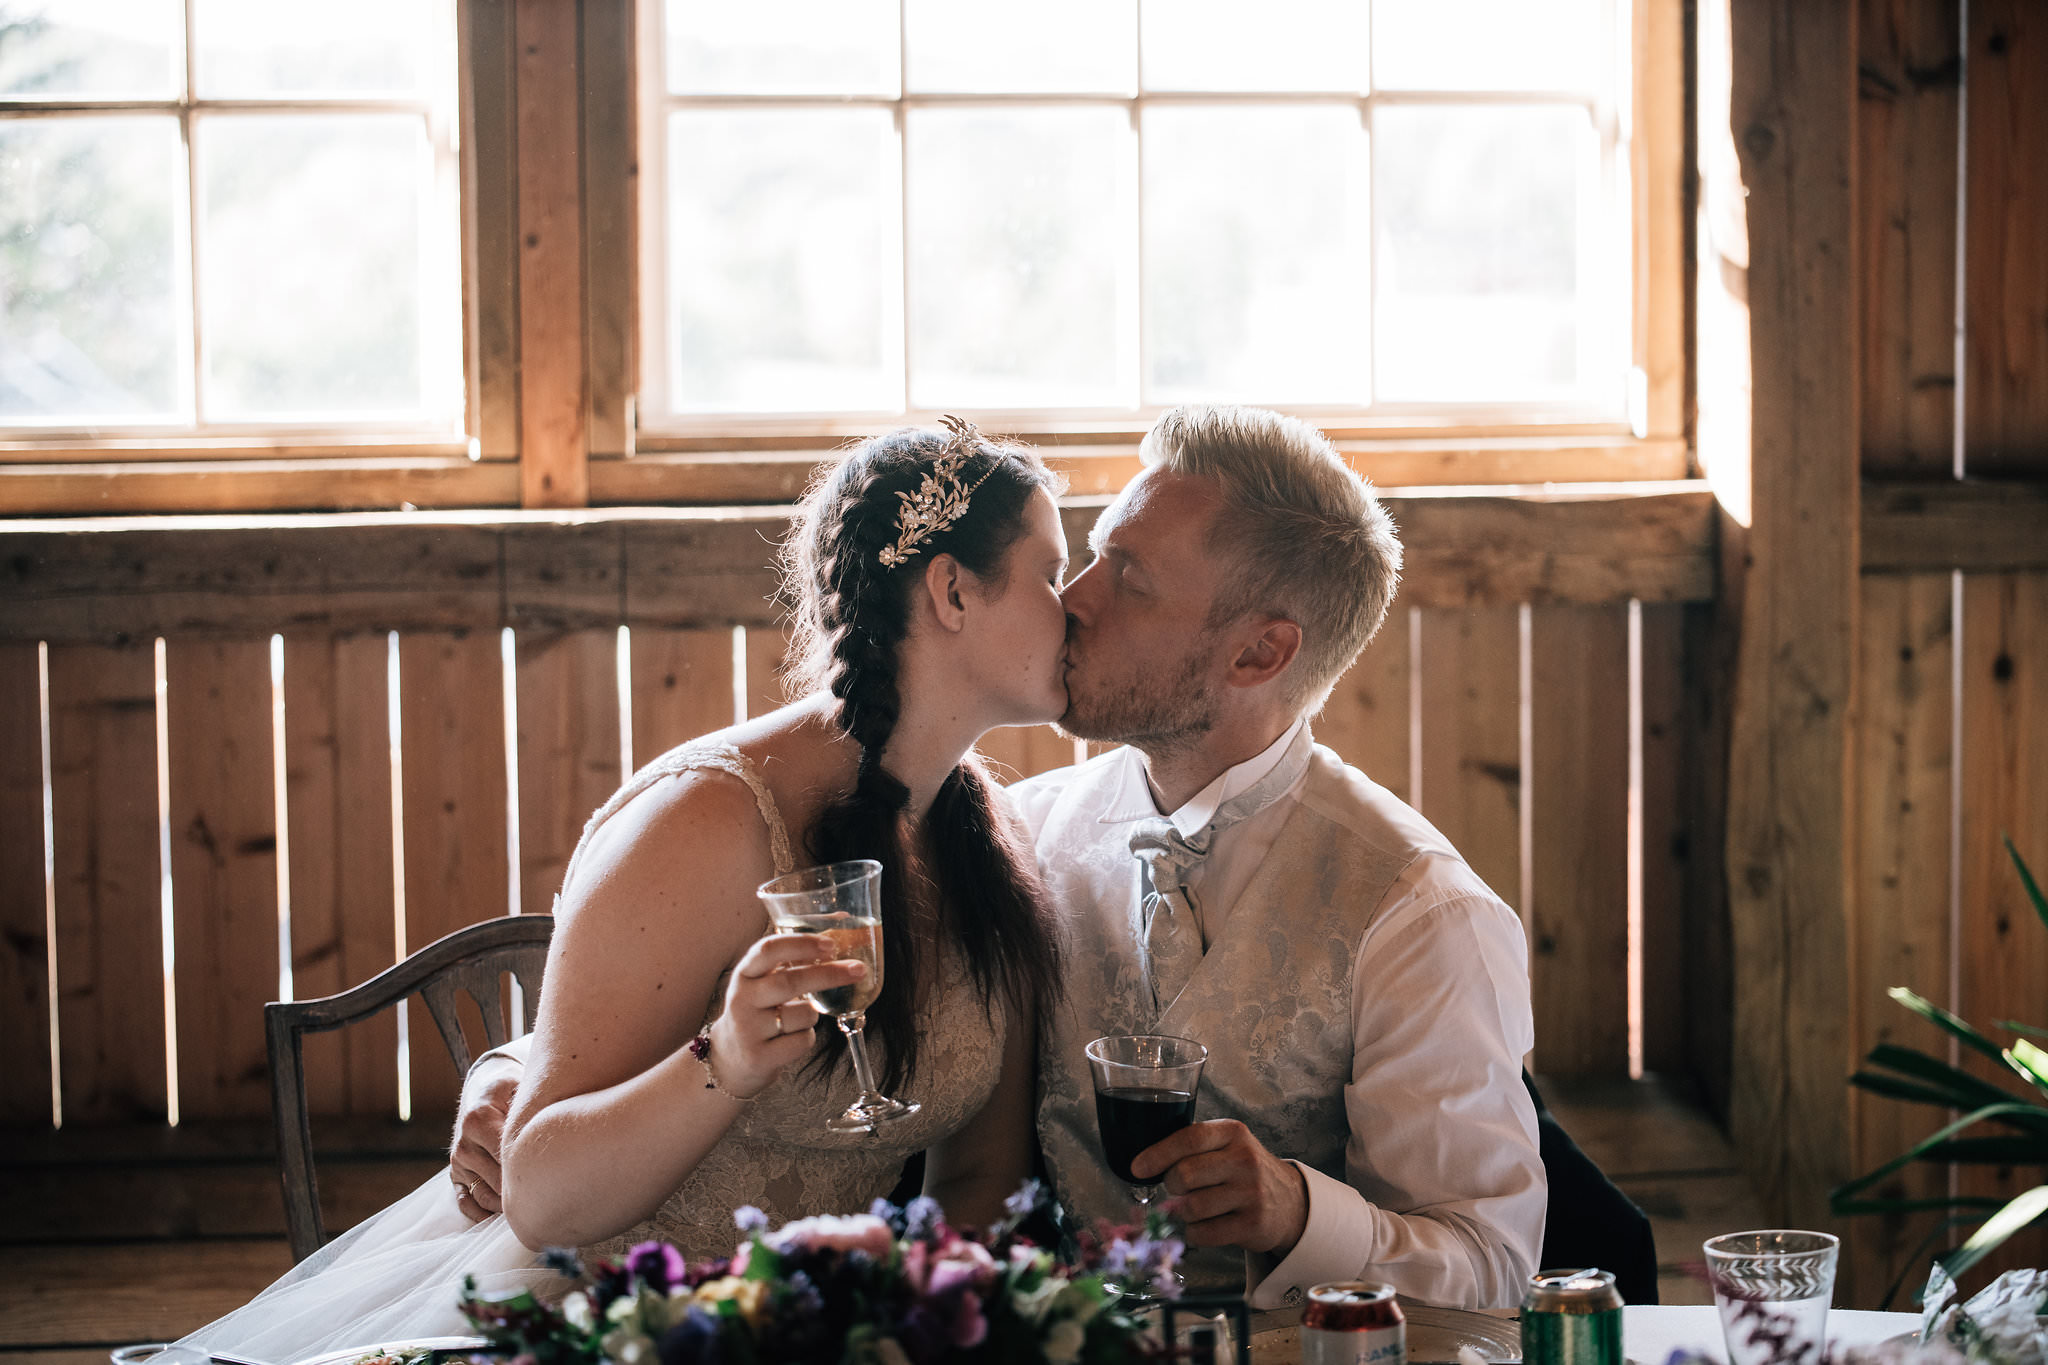 _N850471-fotograf-vestfold-bryllupsfotograf-.jpg